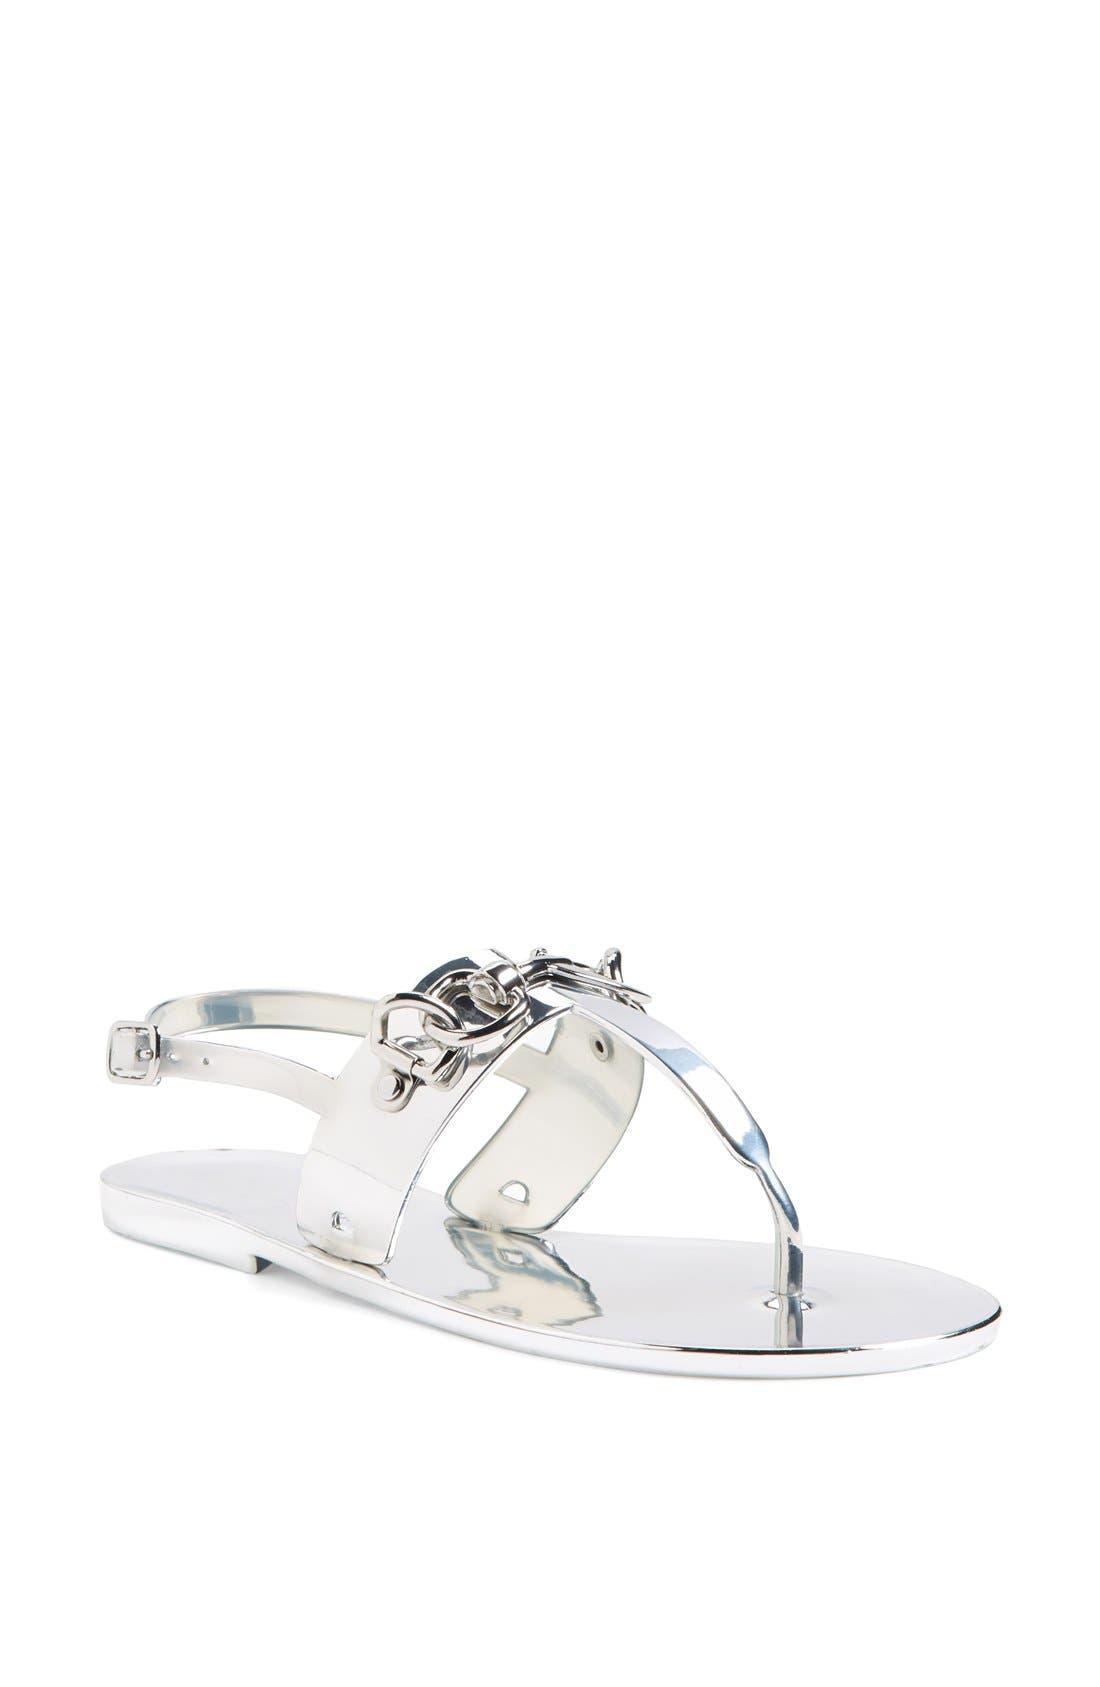 Main Image - Rebecca Minkoff 'Petra' Sandal